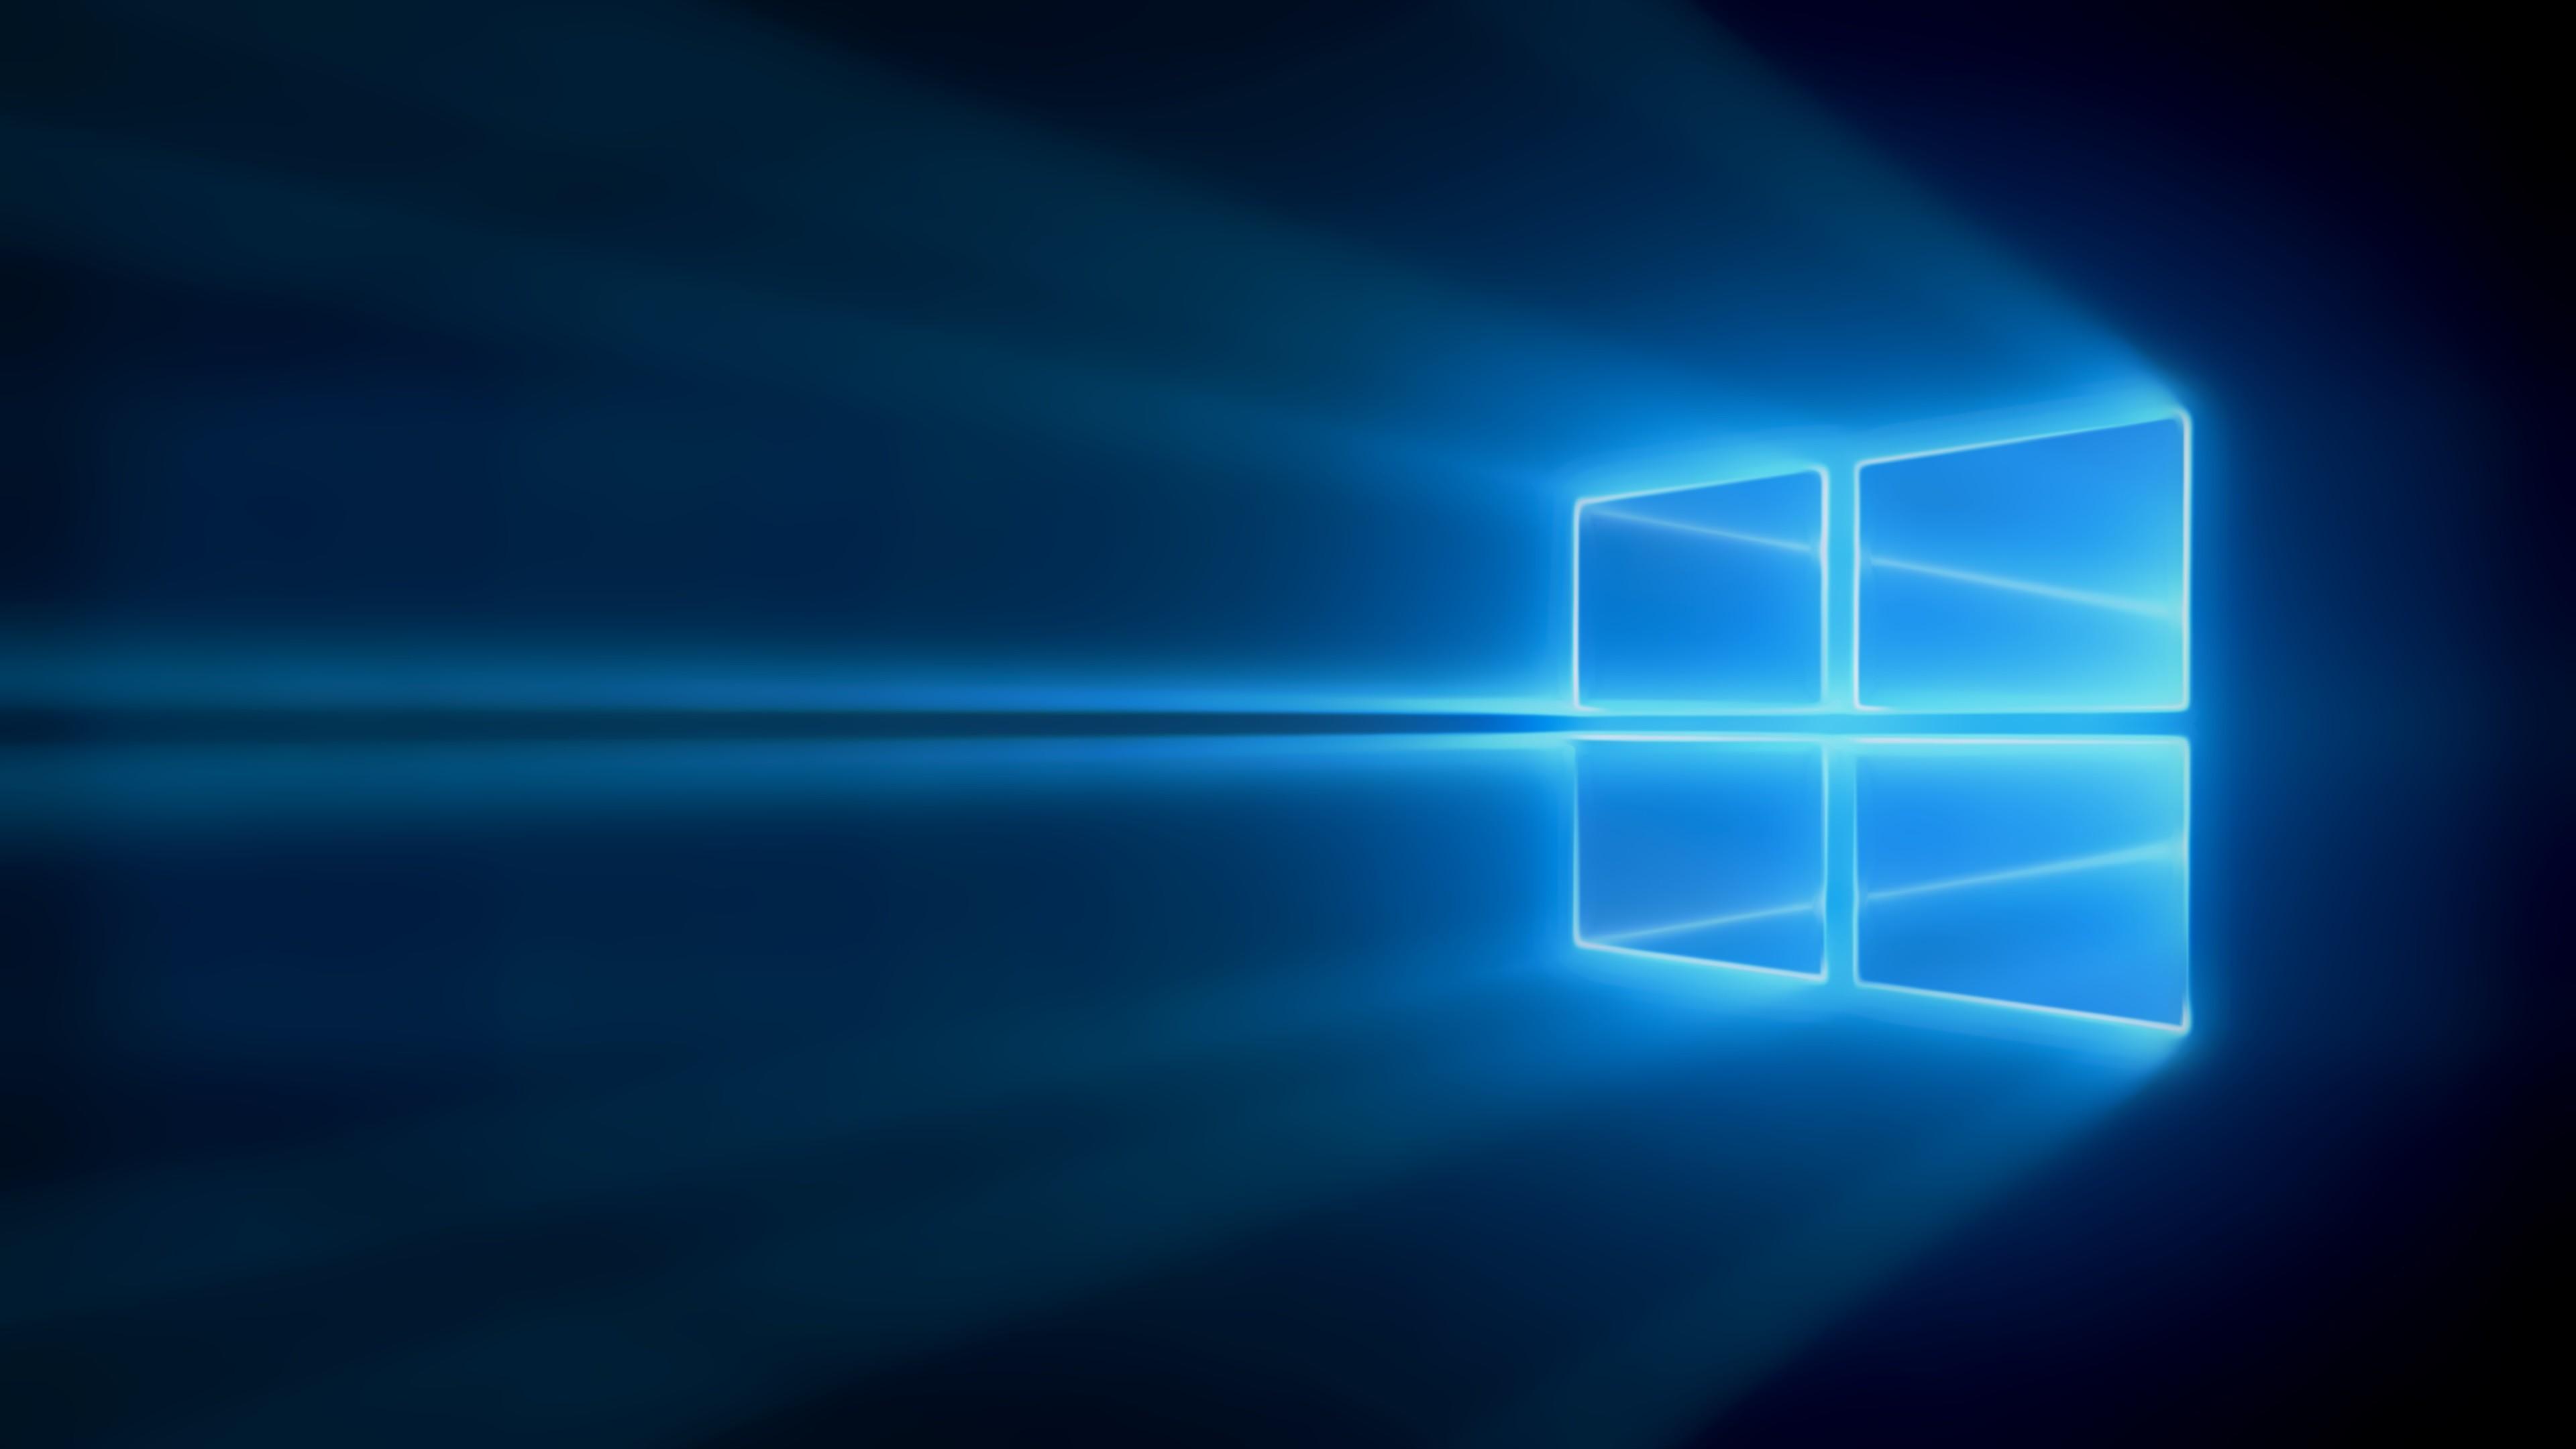 Windows 10 live wallpaper anime